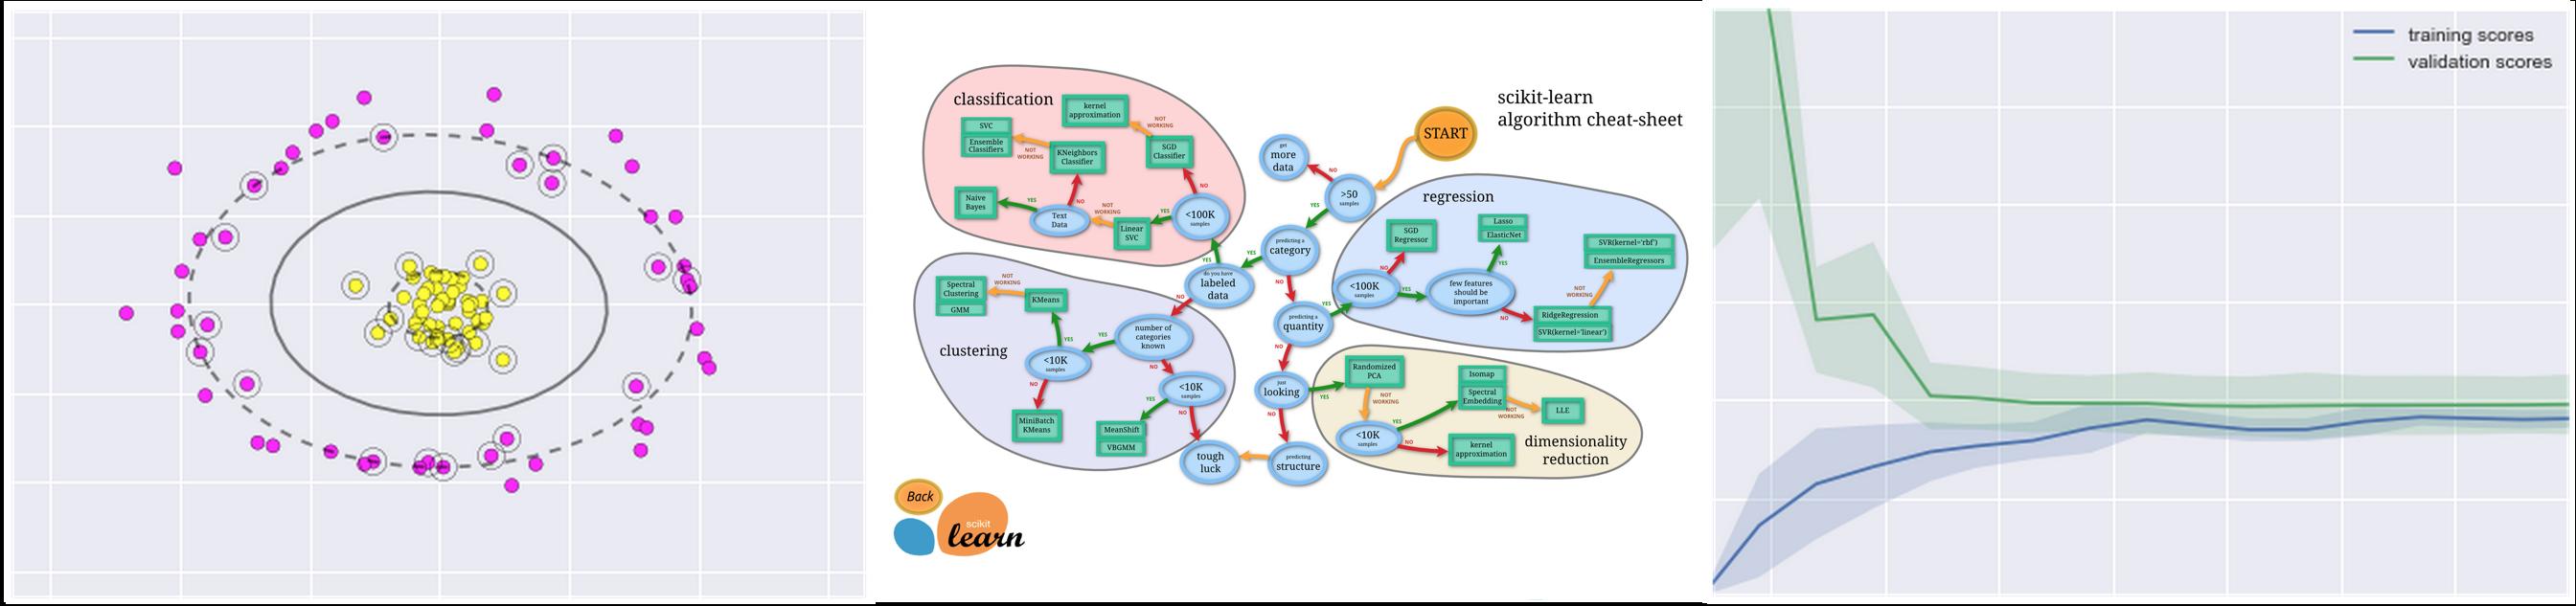 GitHub - donnemartin/data-science-ipython-notebooks: Data science